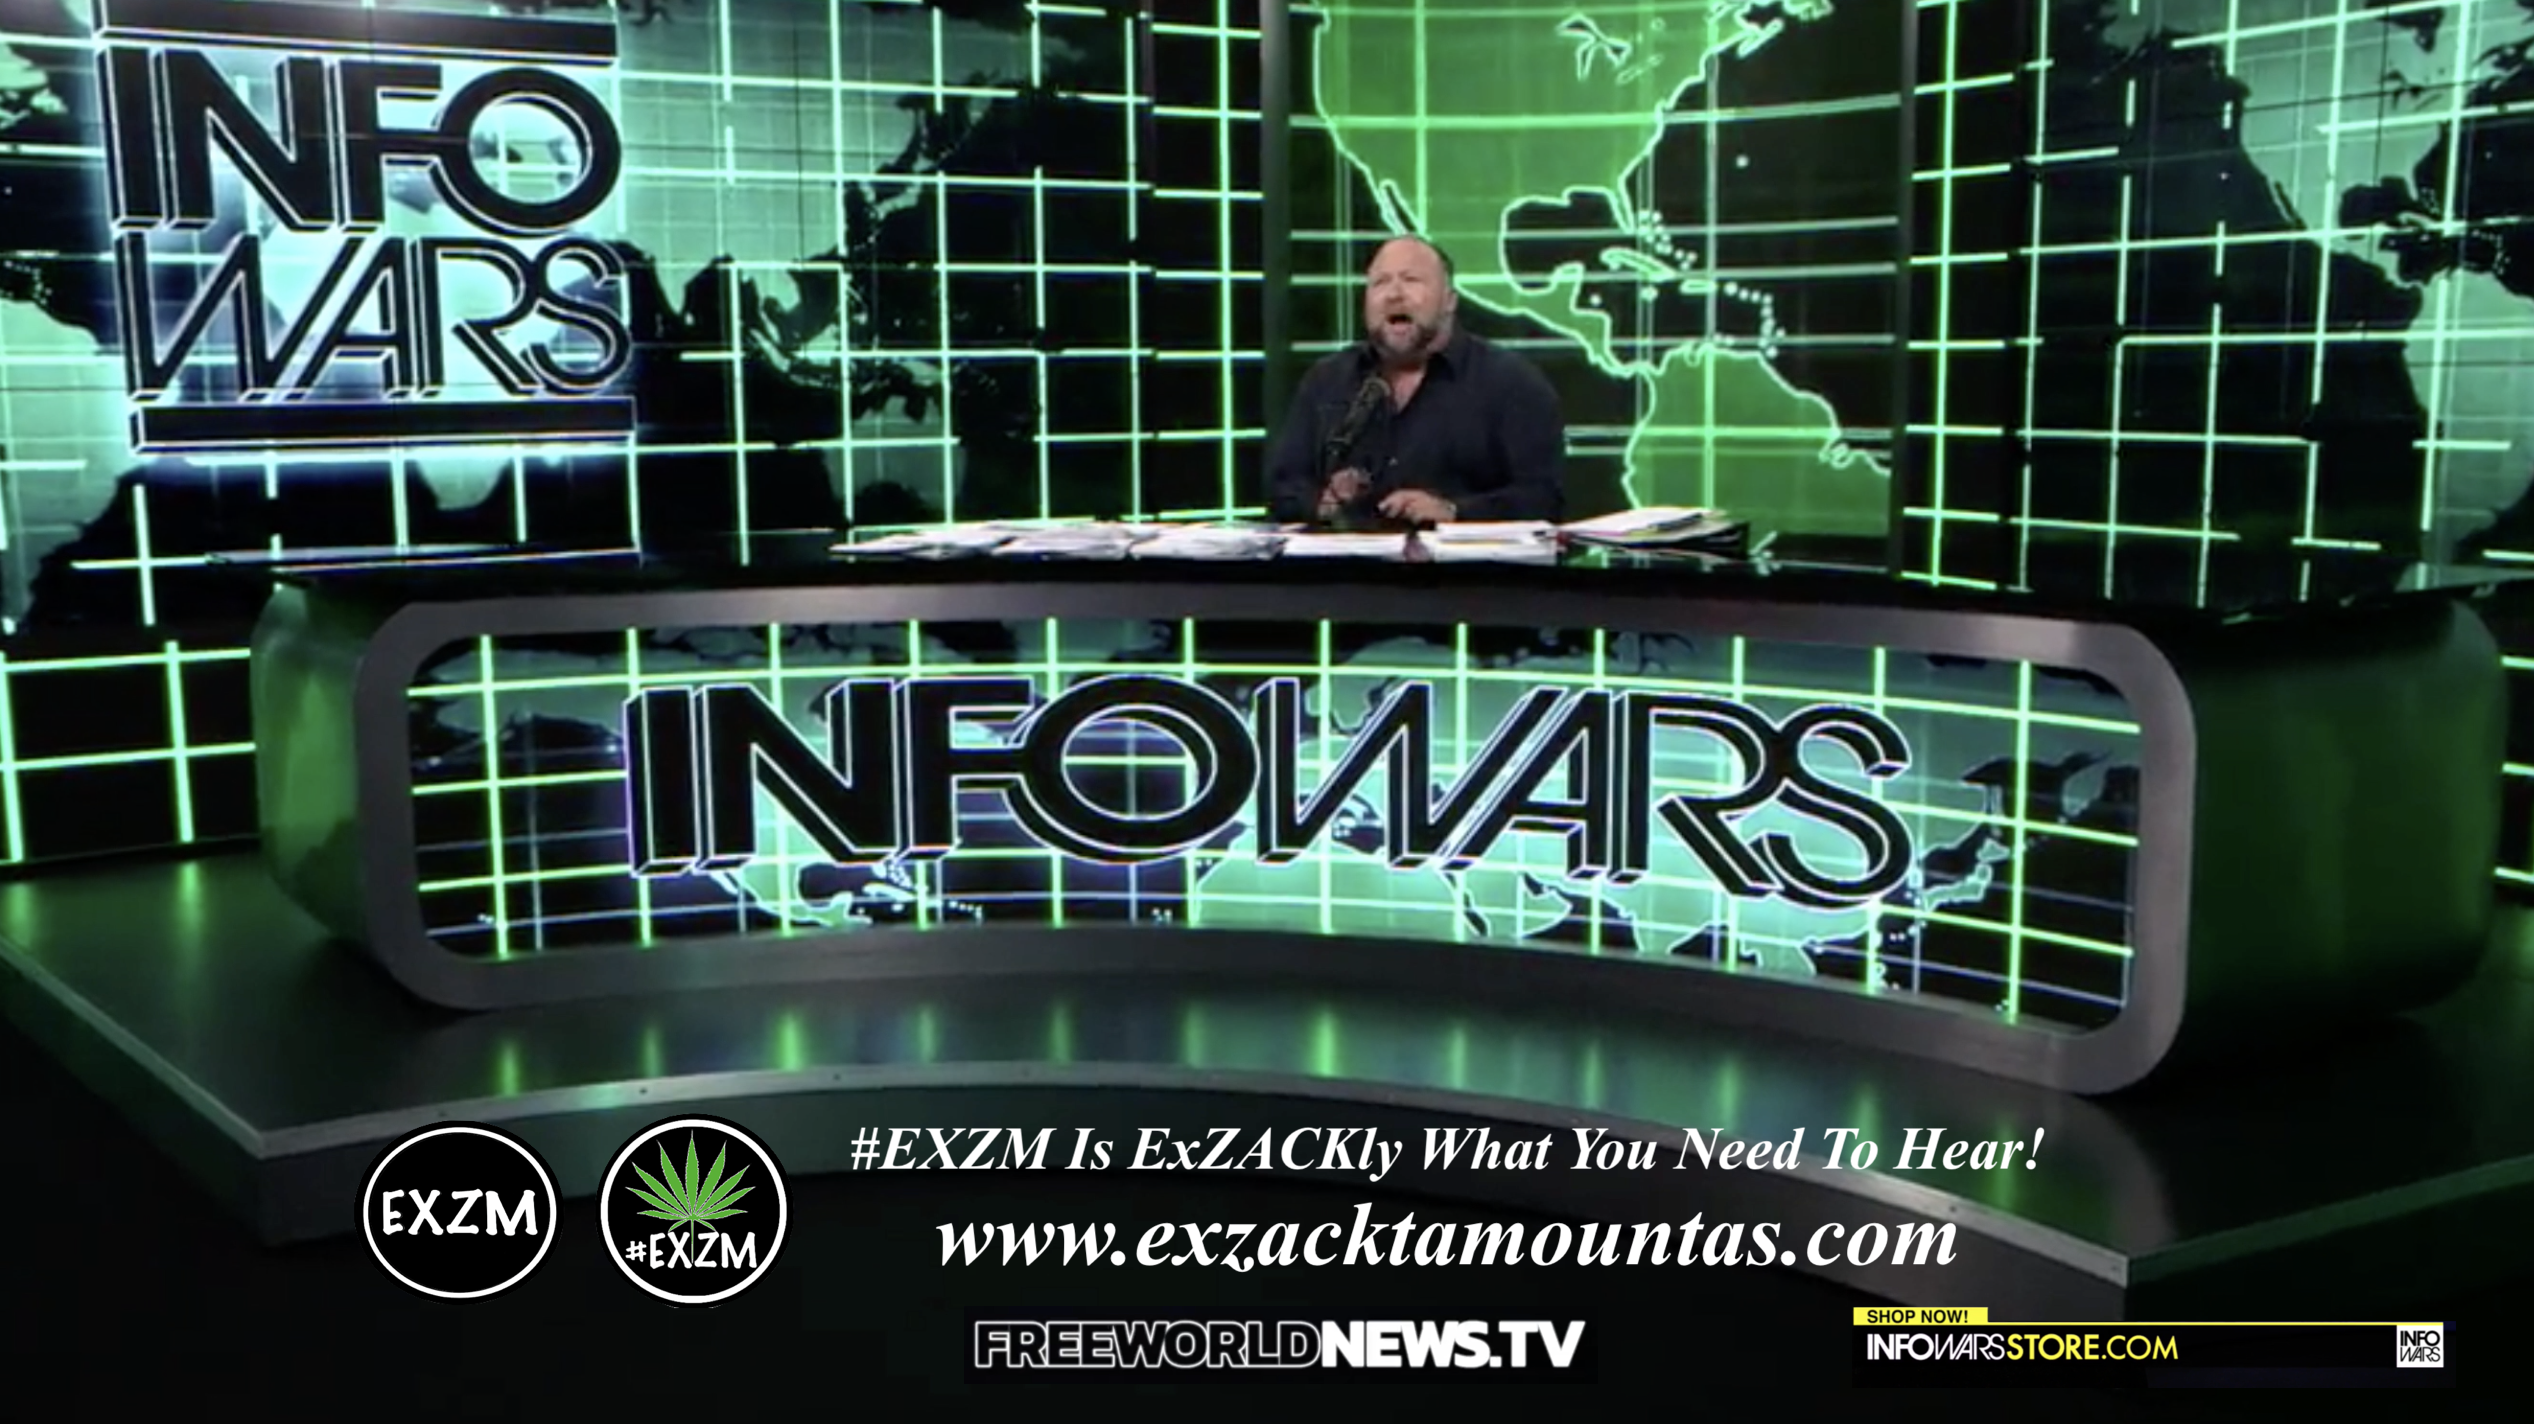 Alex Jones Live In Infowars Studio Free World News TV EXZM Zack Mount August 19th 2021 copy